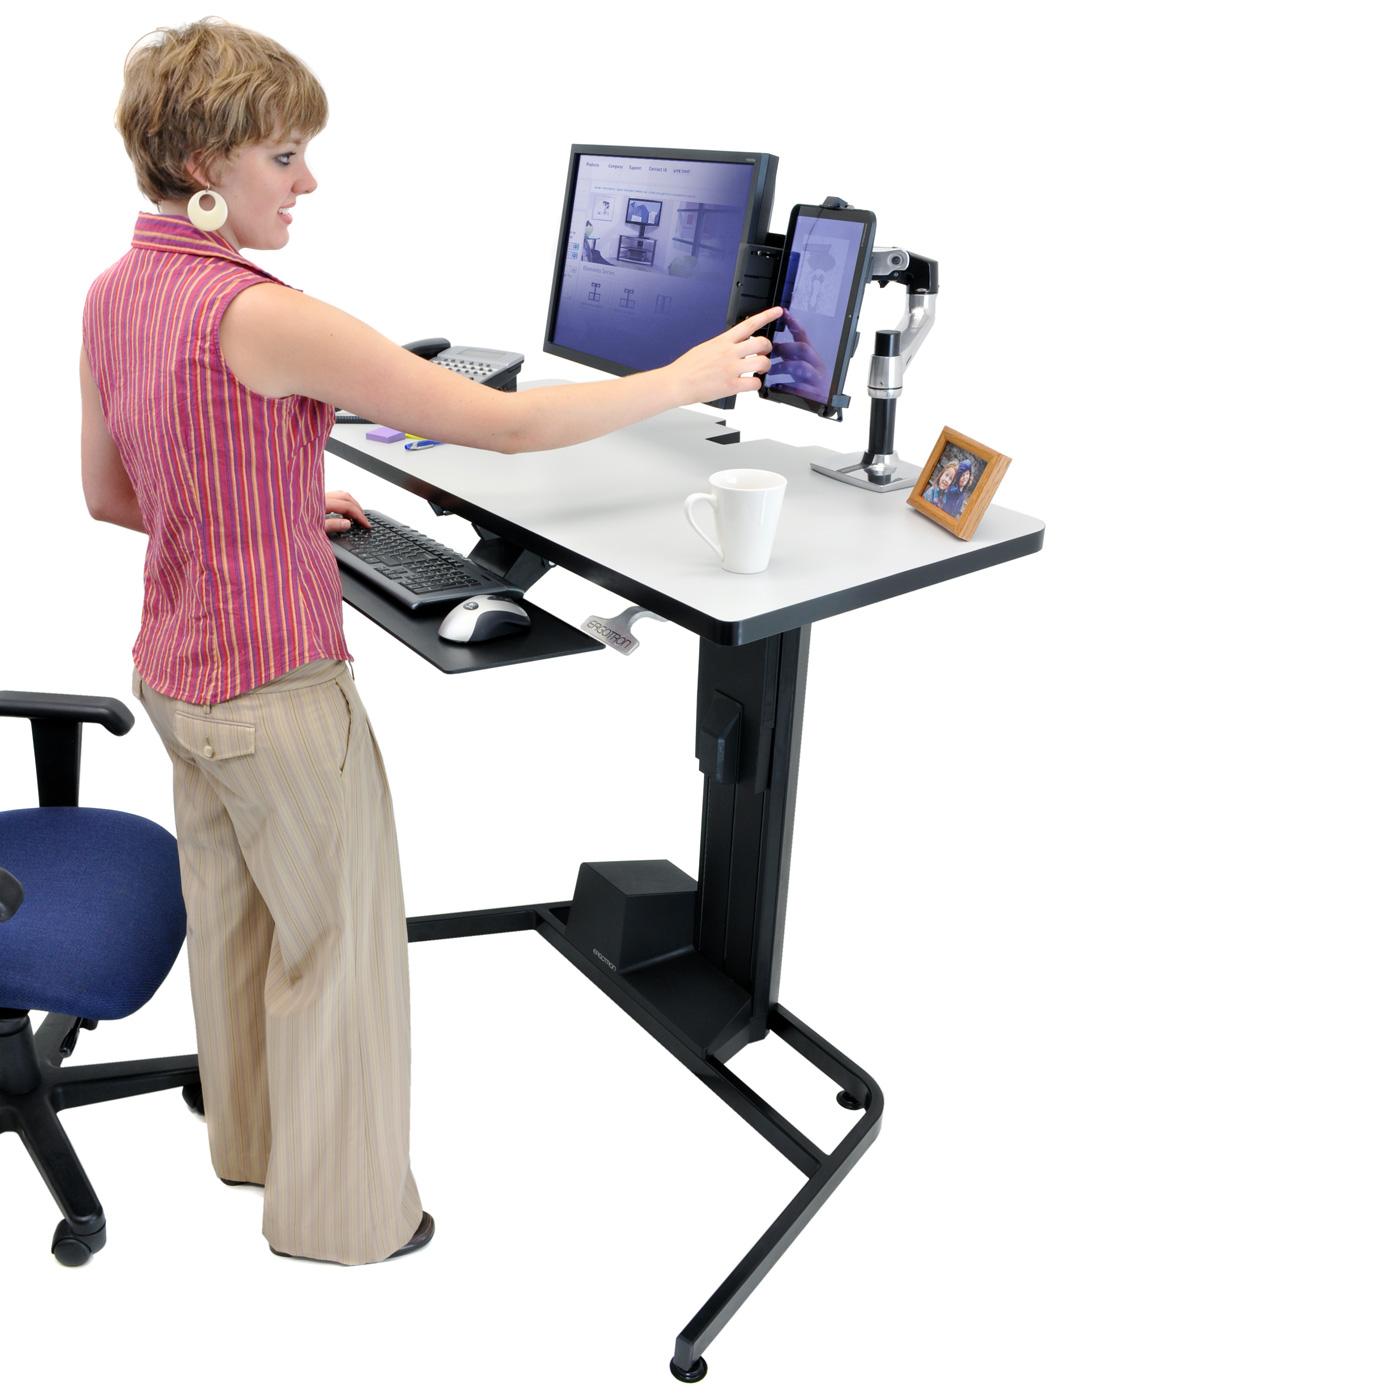 ergotron workfit d sit stand desk bras pied ergotron sur. Black Bedroom Furniture Sets. Home Design Ideas